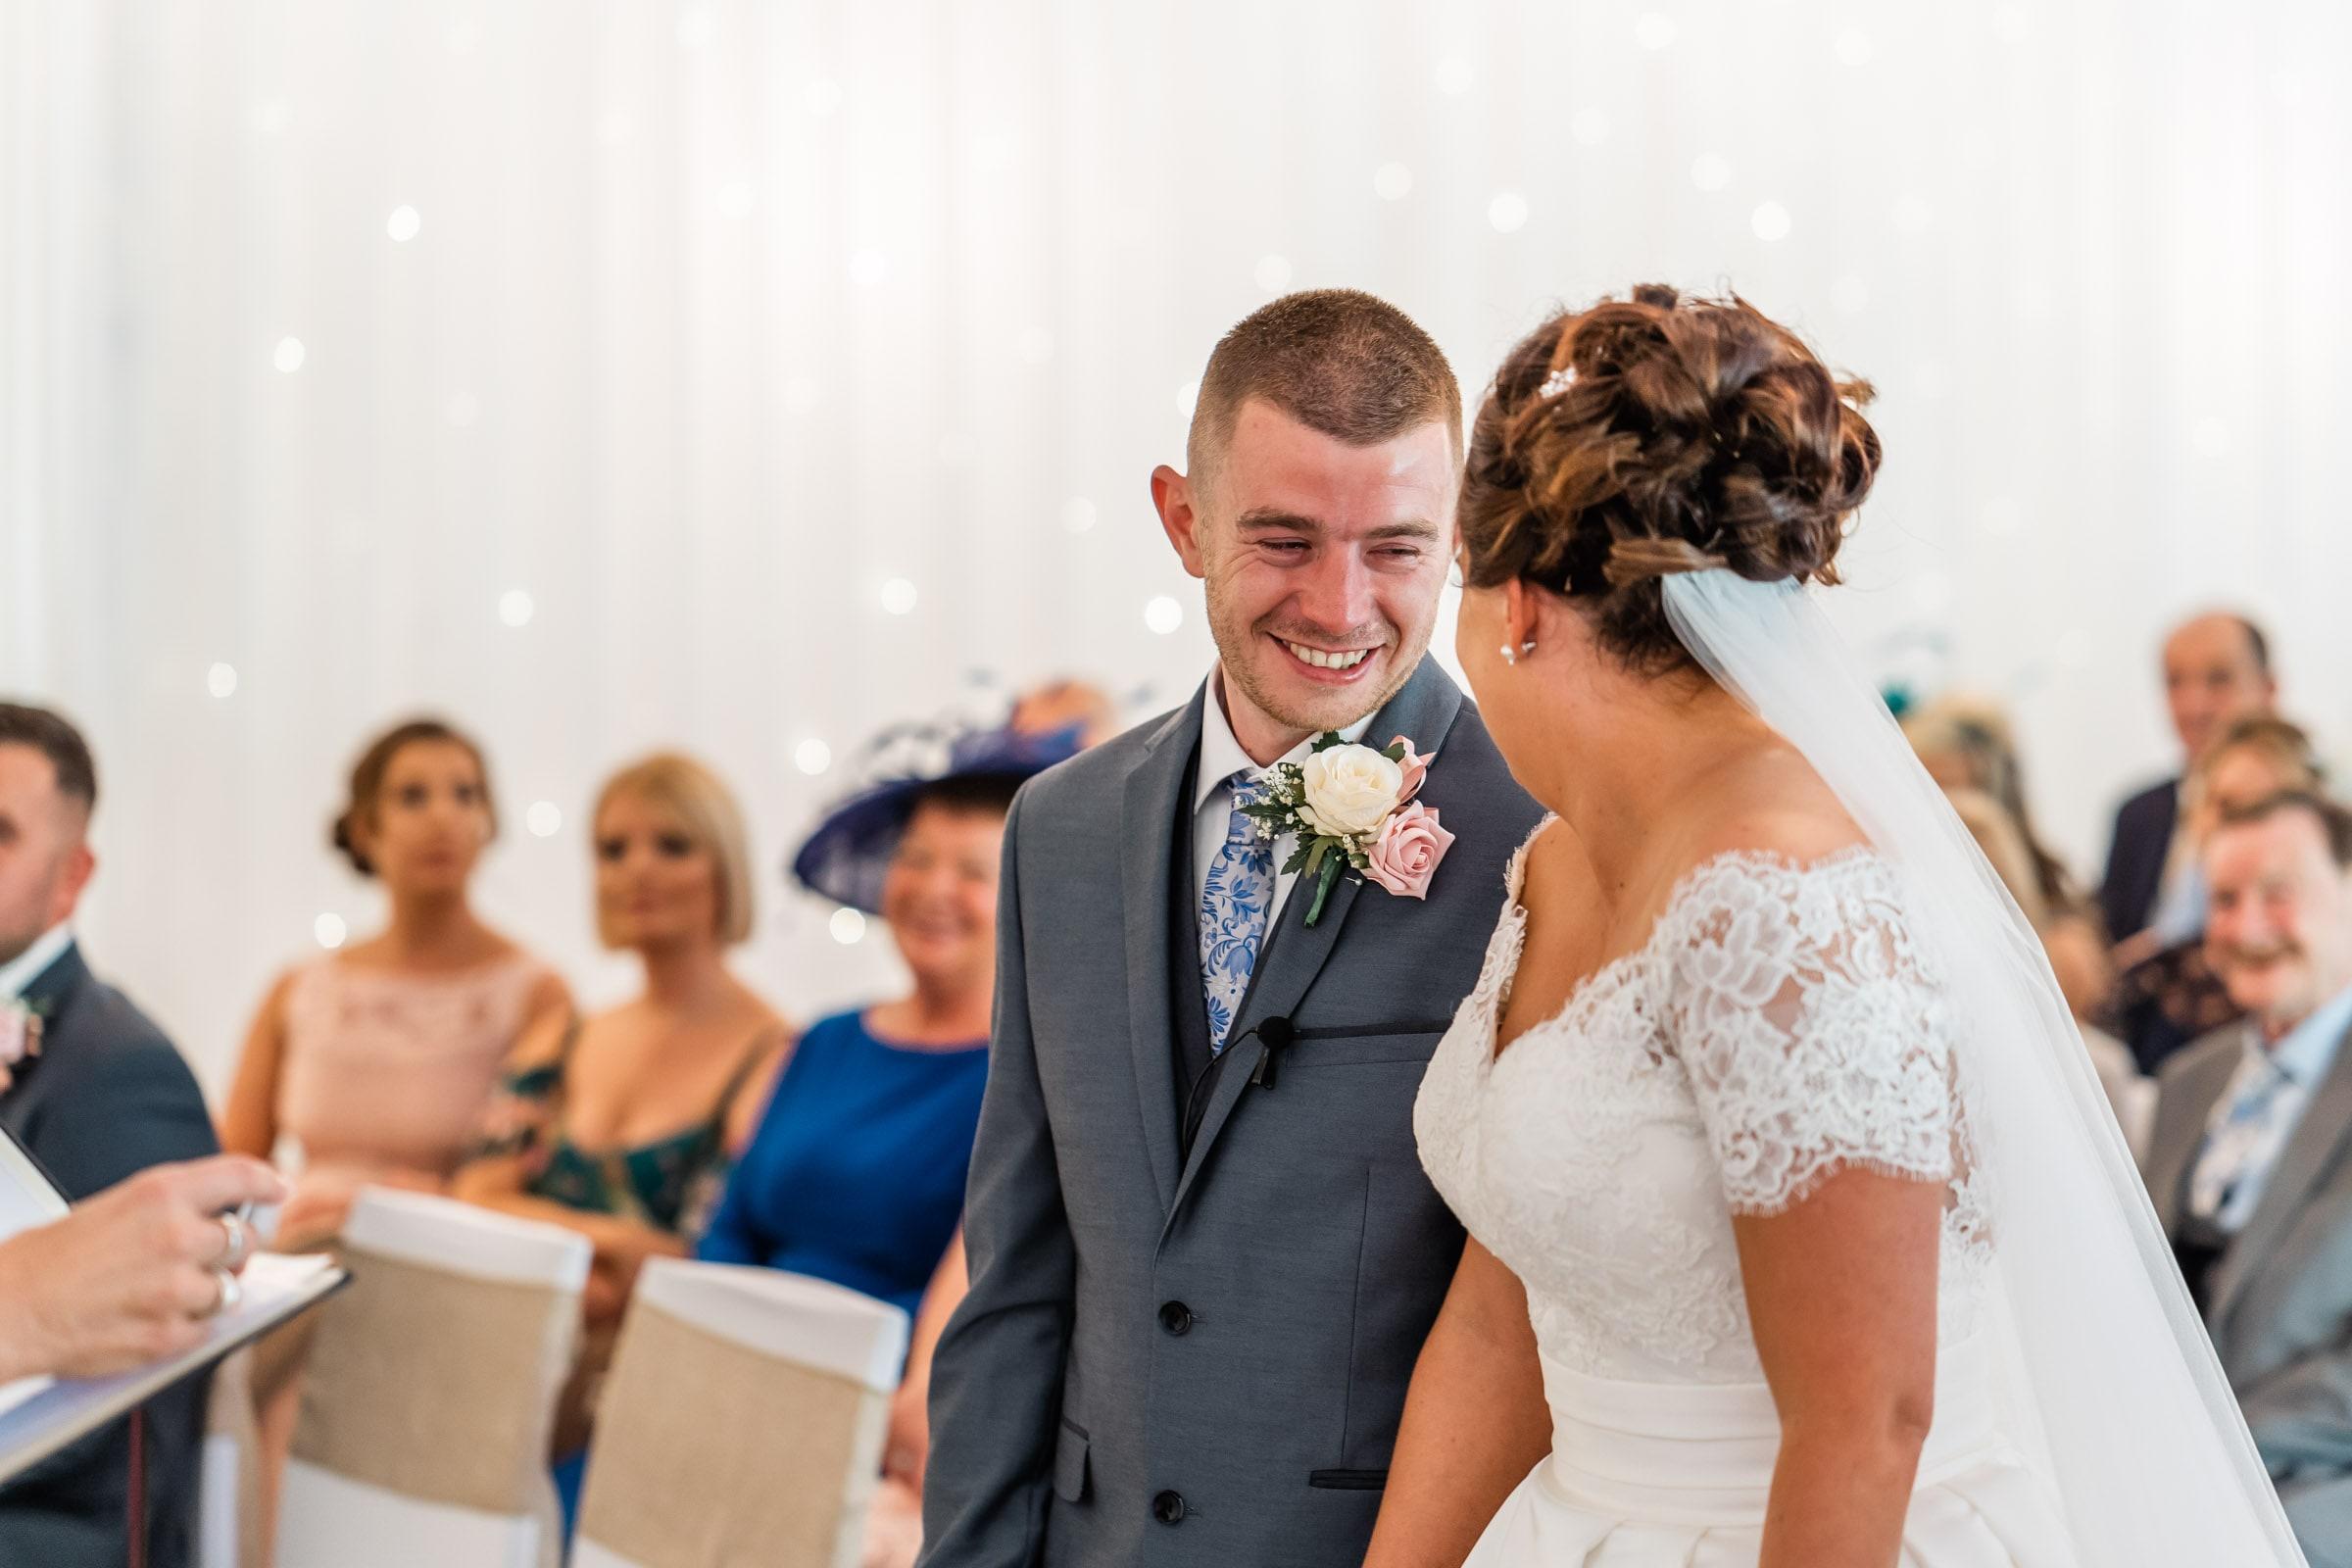 Dalmeny-Park-Glasgow-Wedding-Dearly-Photography-Scotland (20 of 75).jpg